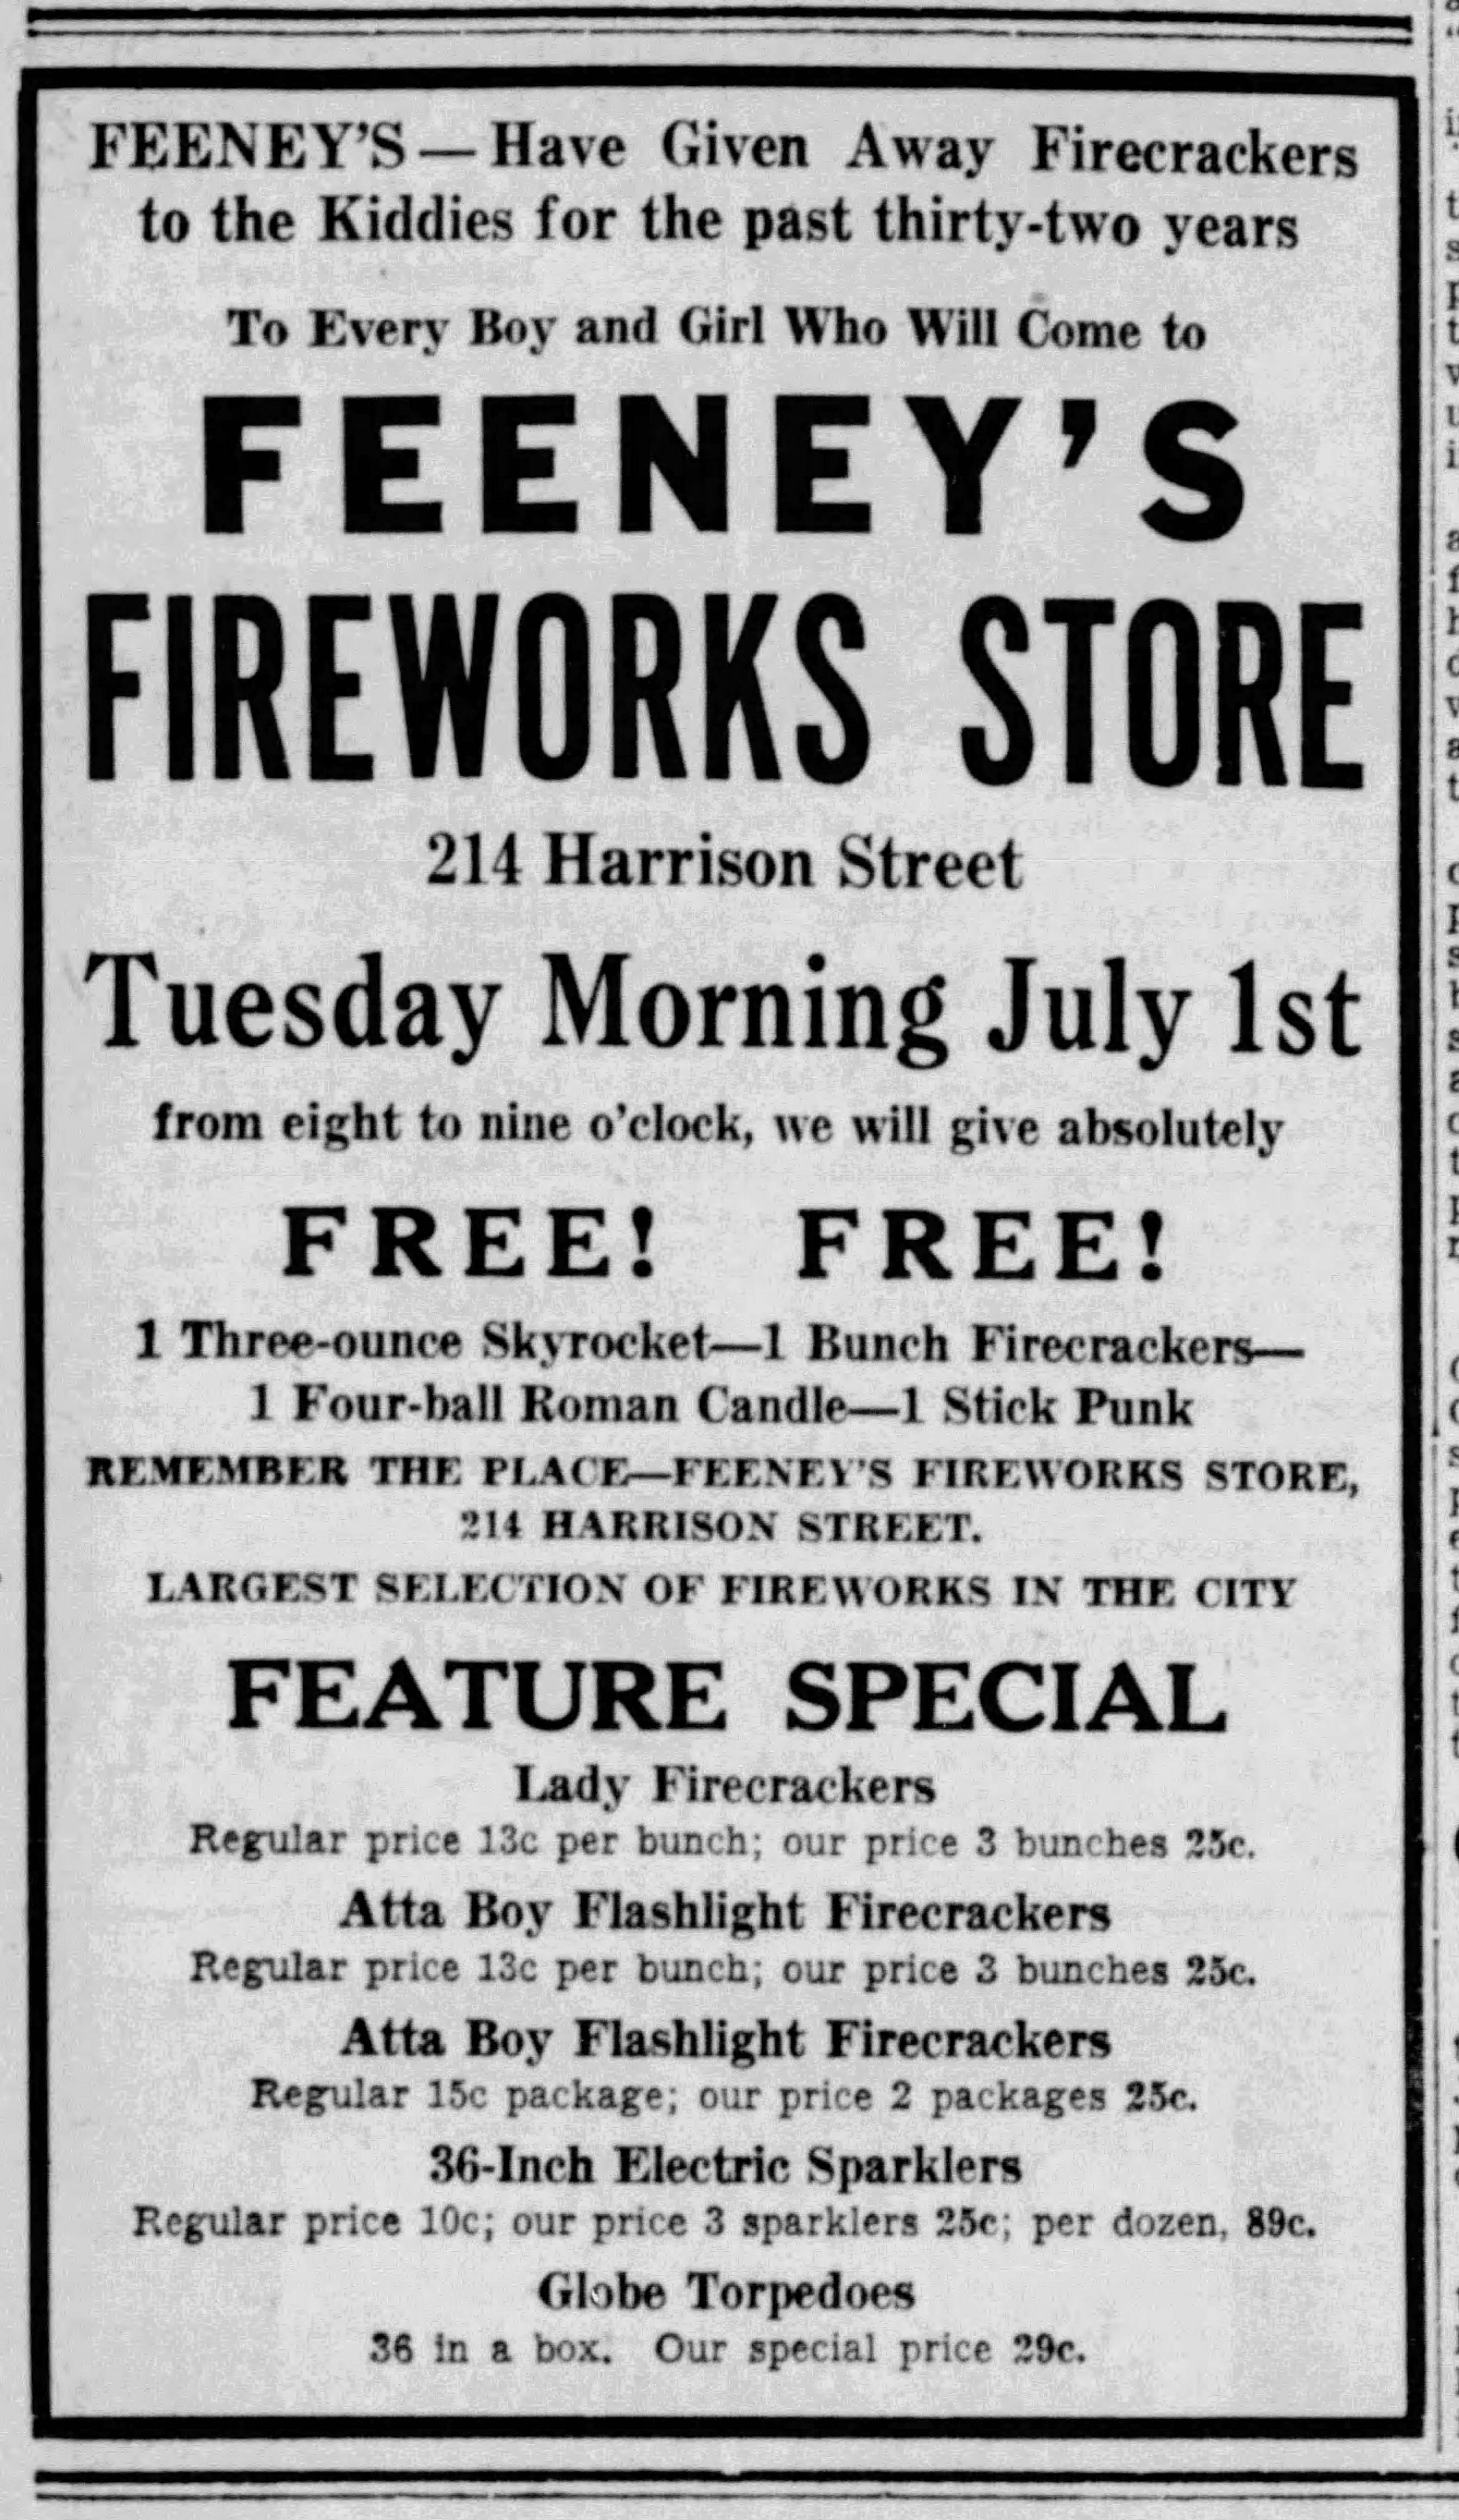 The_Daily_Times_Mon__Jun_30__1930_p7